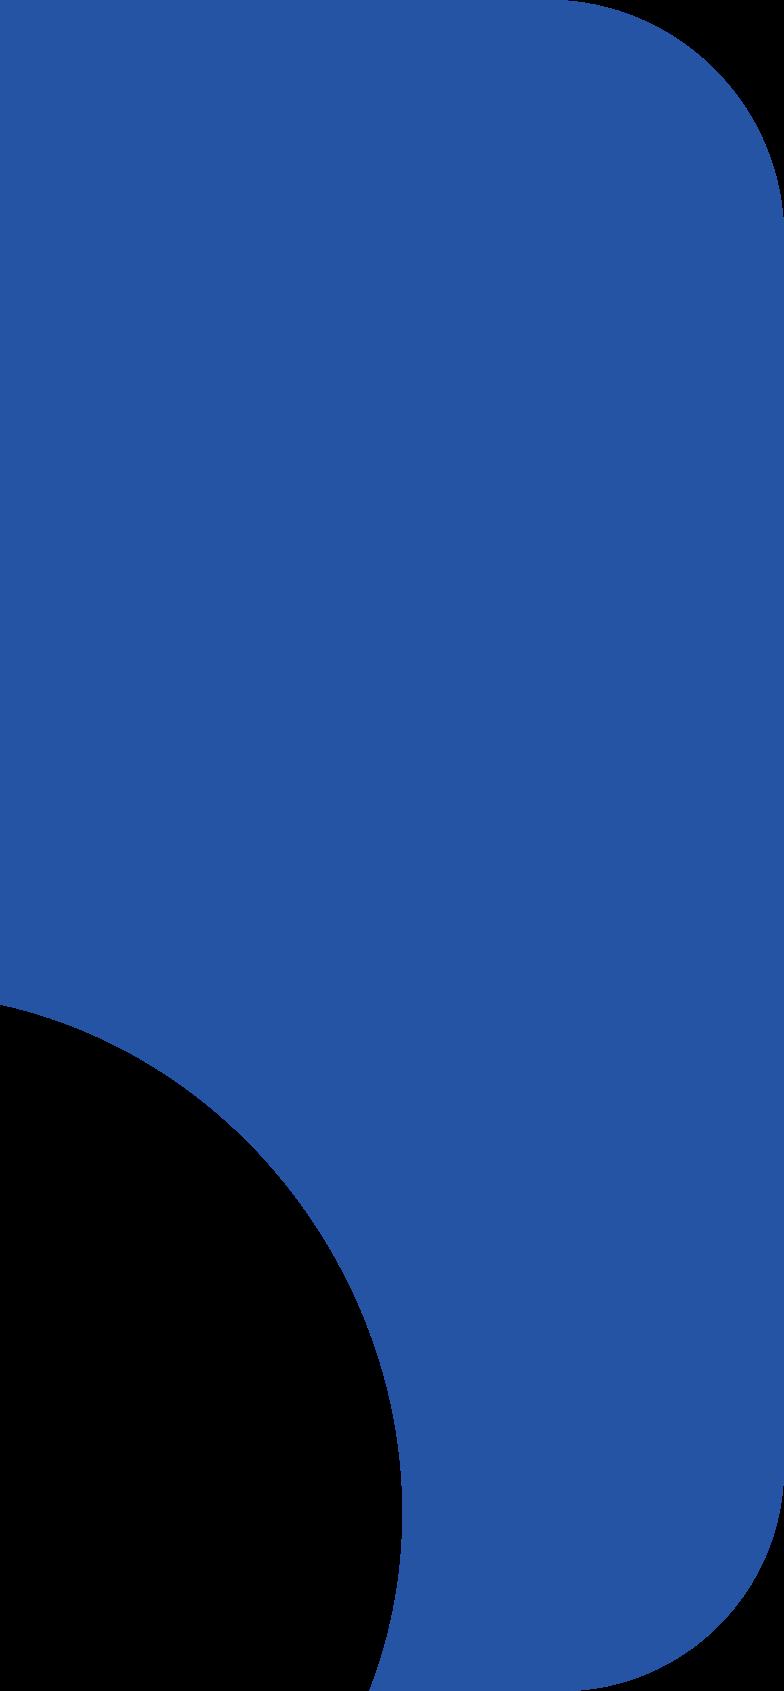 book Clipart illustration in PNG, SVG